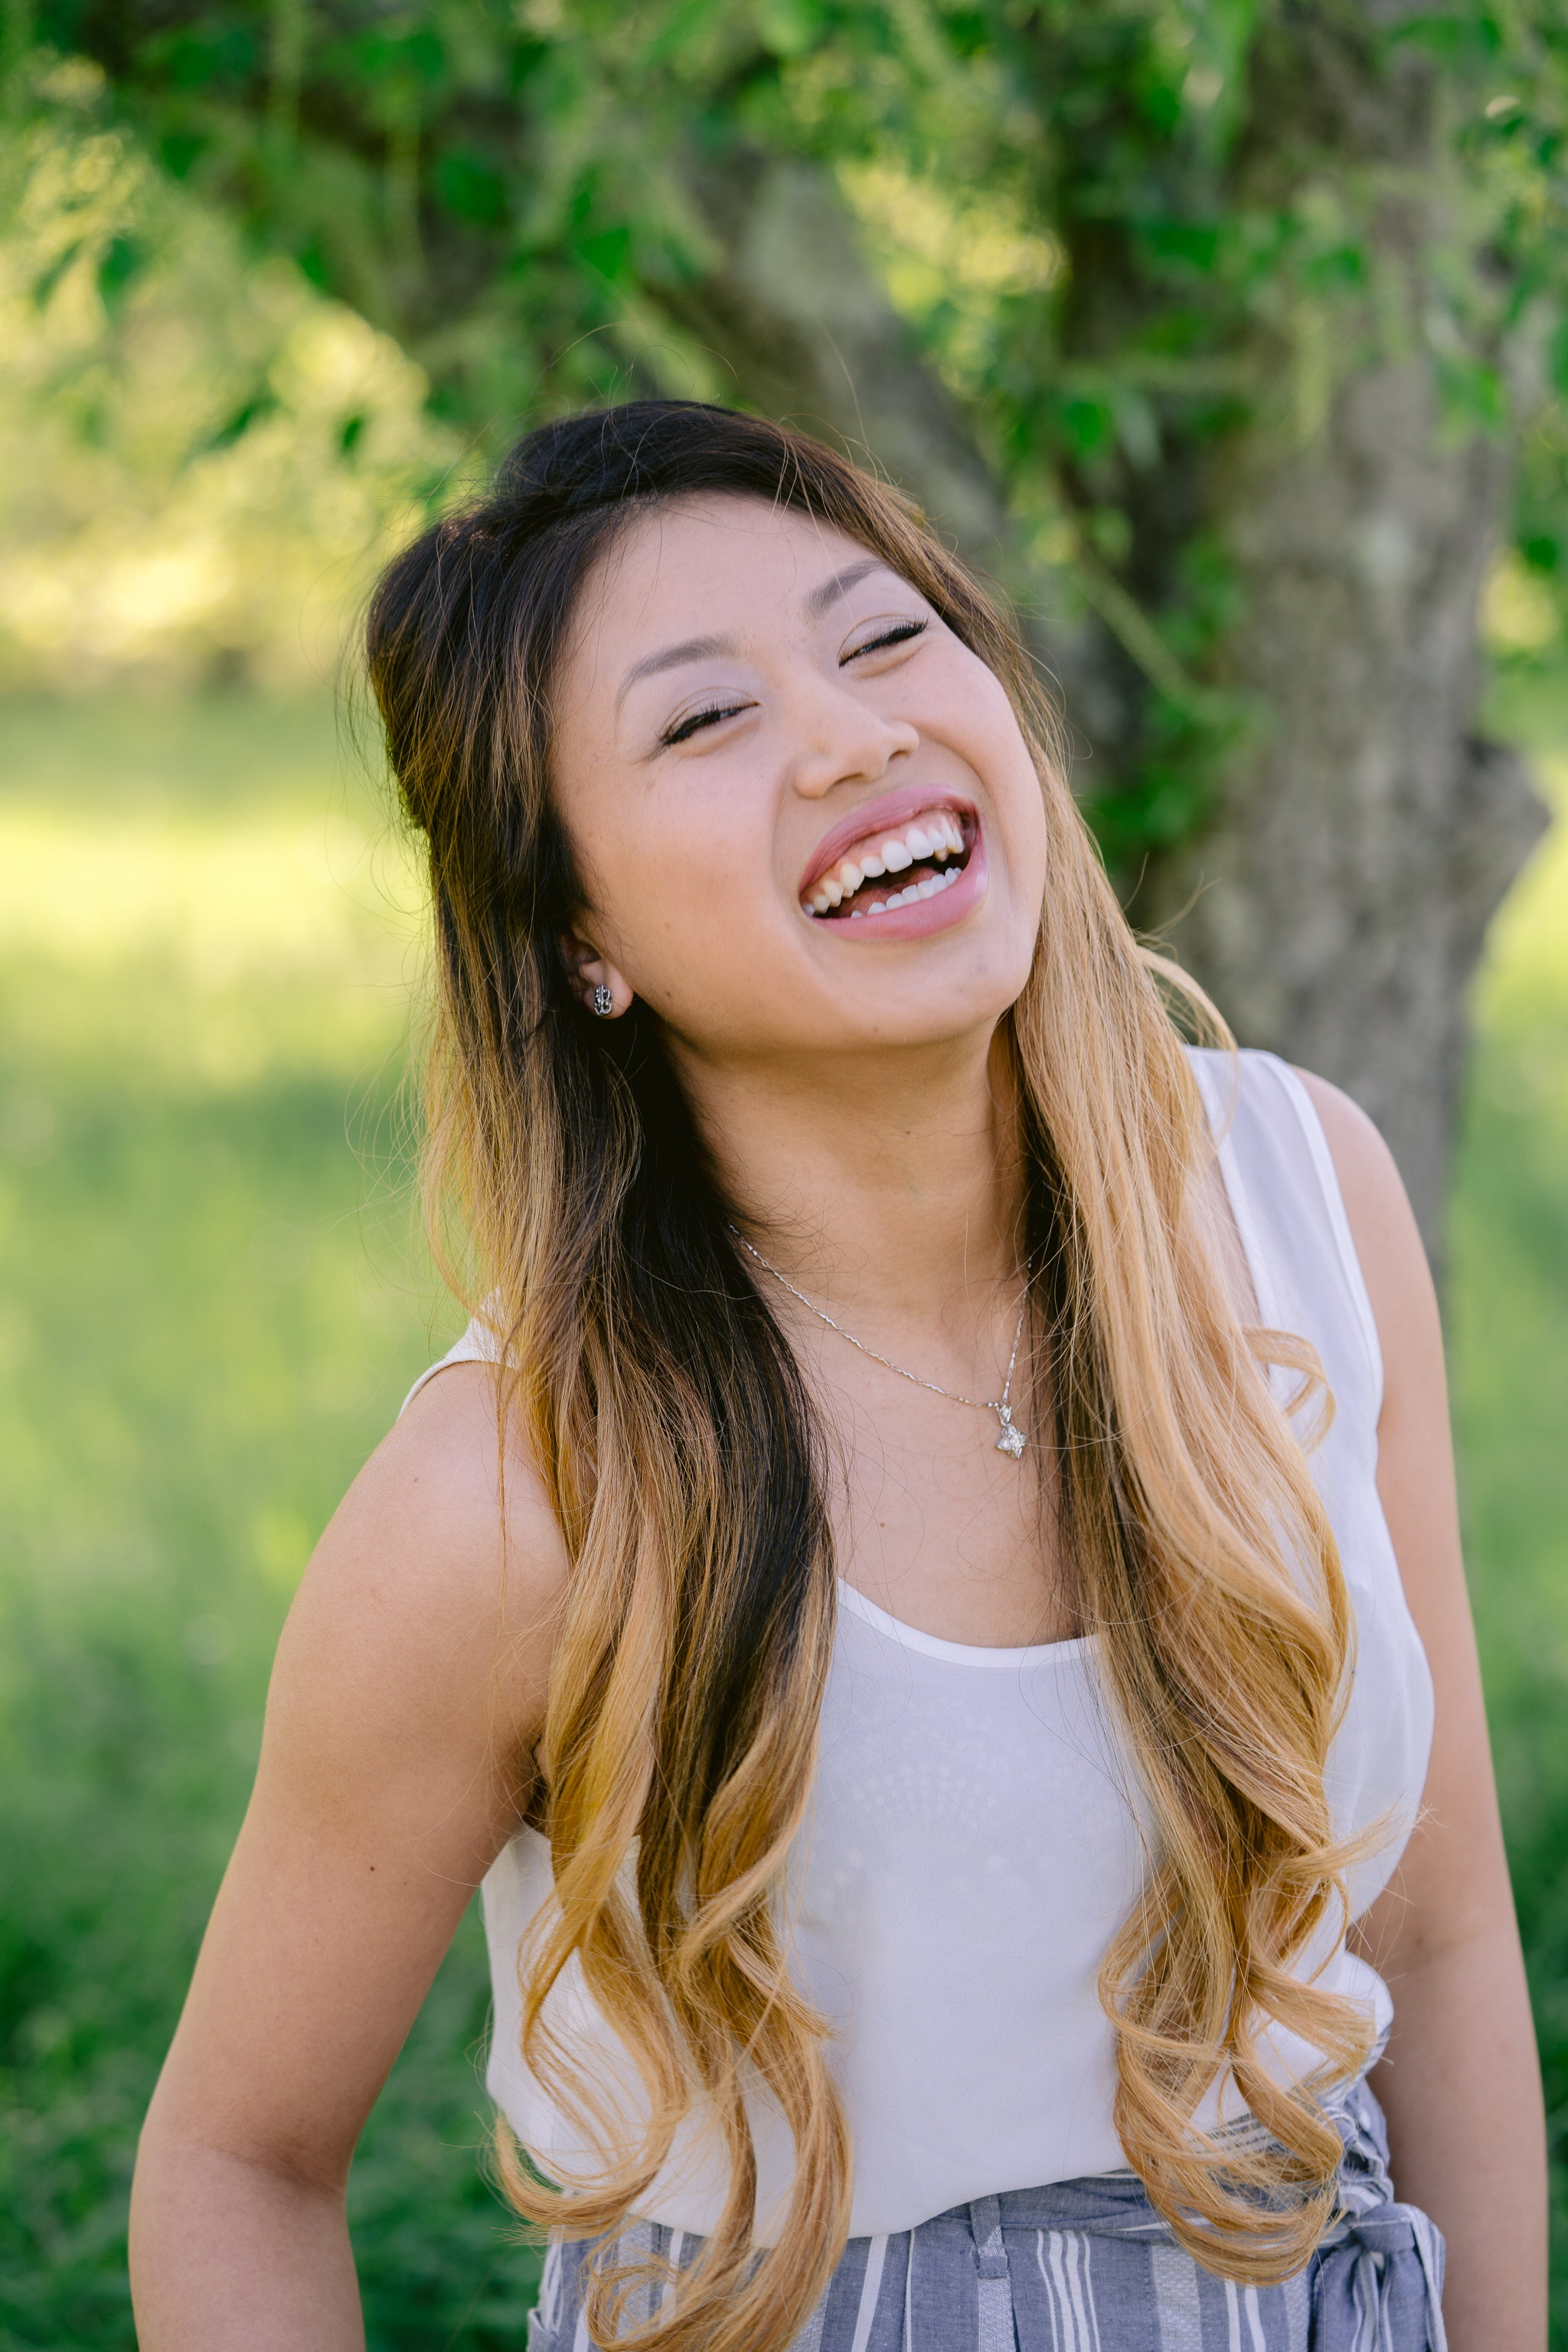 Cute Laughing Headshot